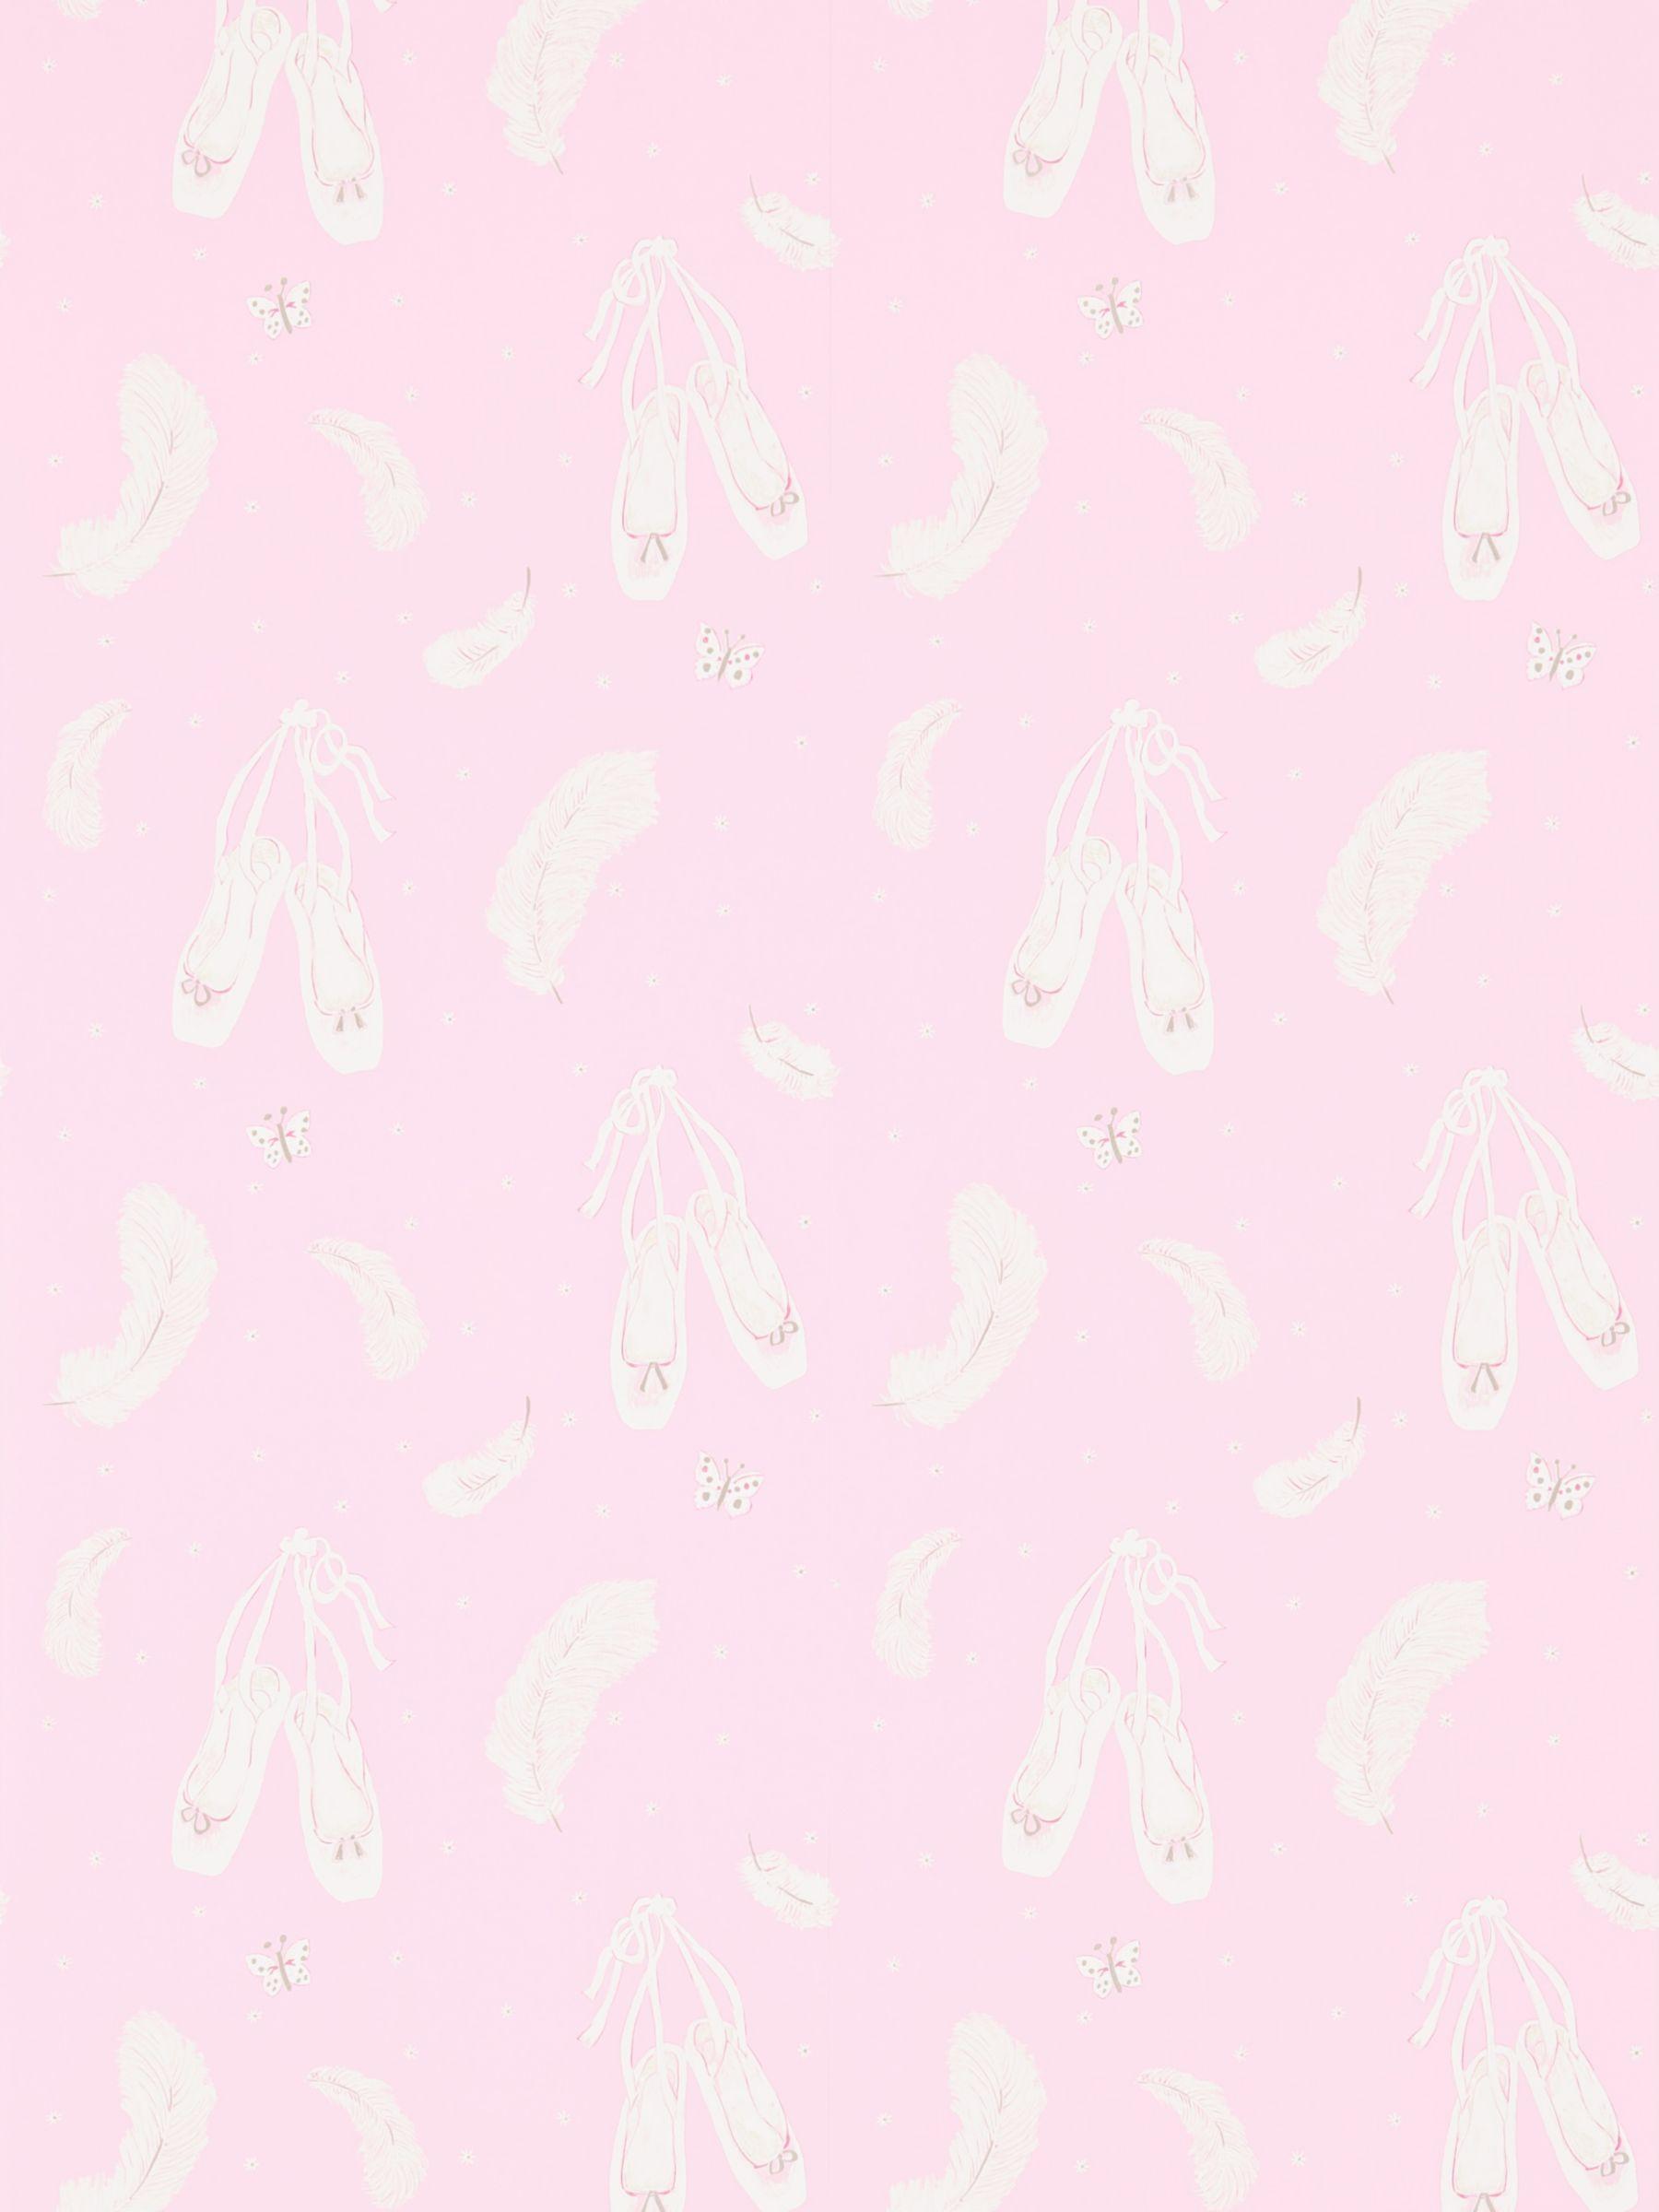 Sanderson Sanderson Ballet Shoes Wallpaper